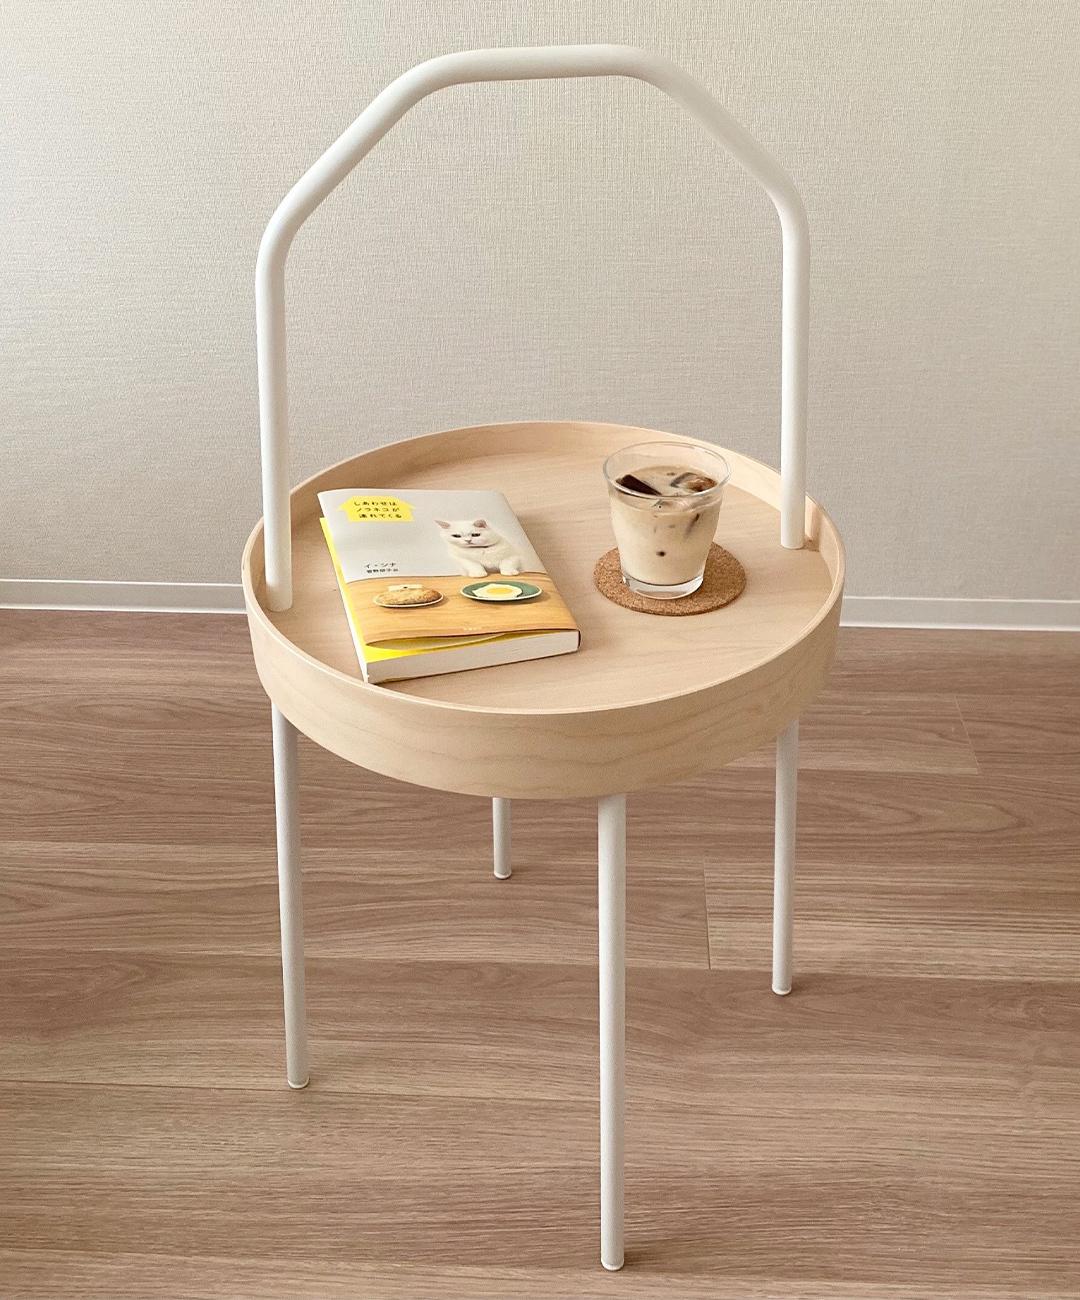 IKEAのインテリア名品をもっと見る_1_4